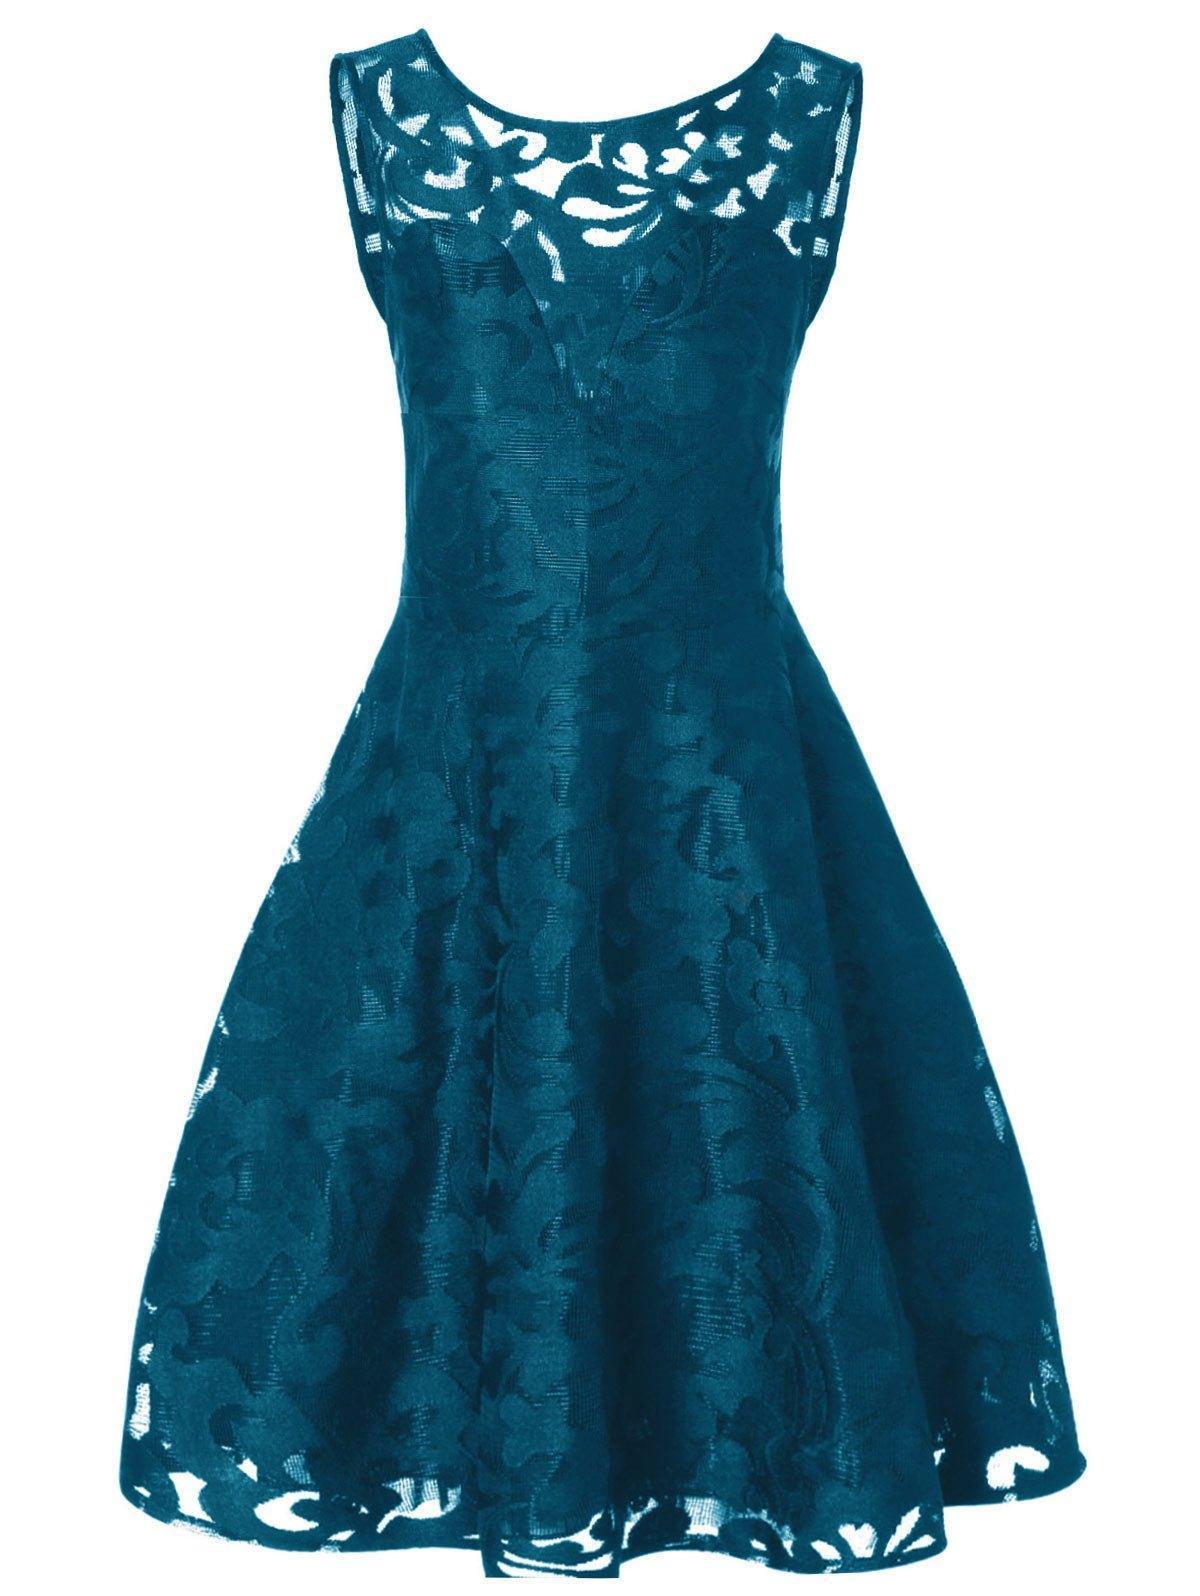 Robe bleu canard dentelle